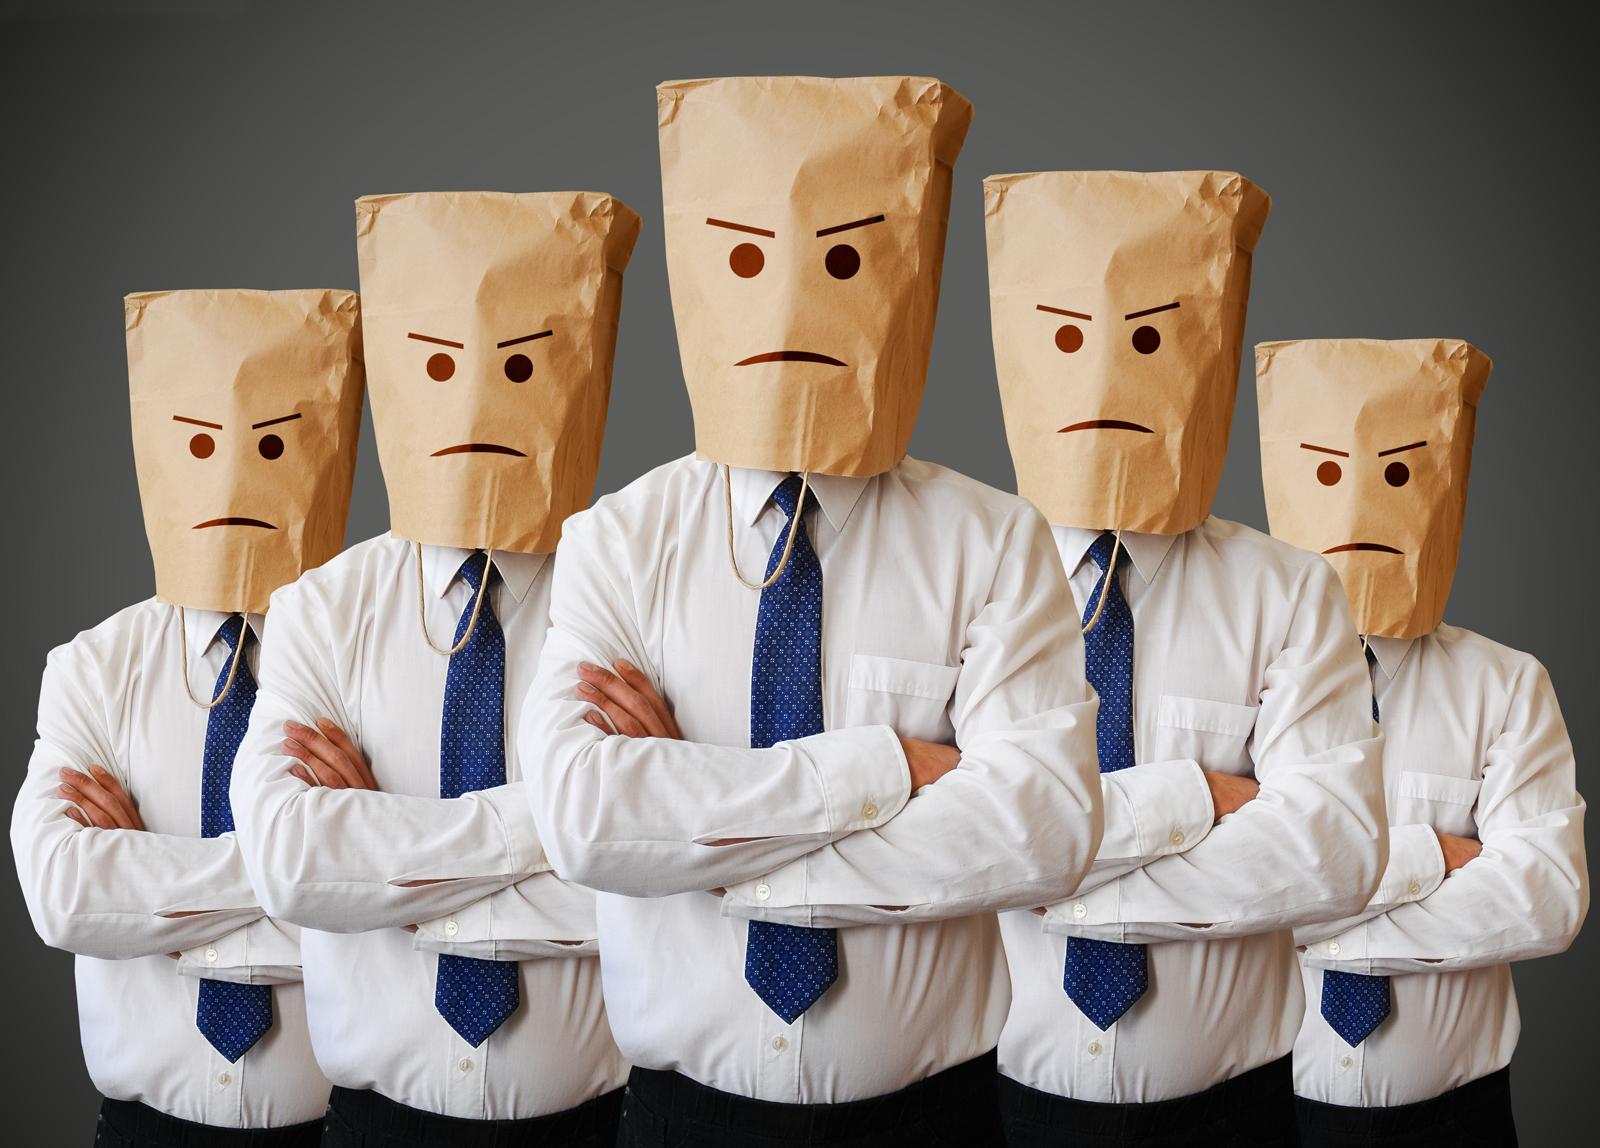 Four Reasons Why Entrepreneurs Hate Bureauracy